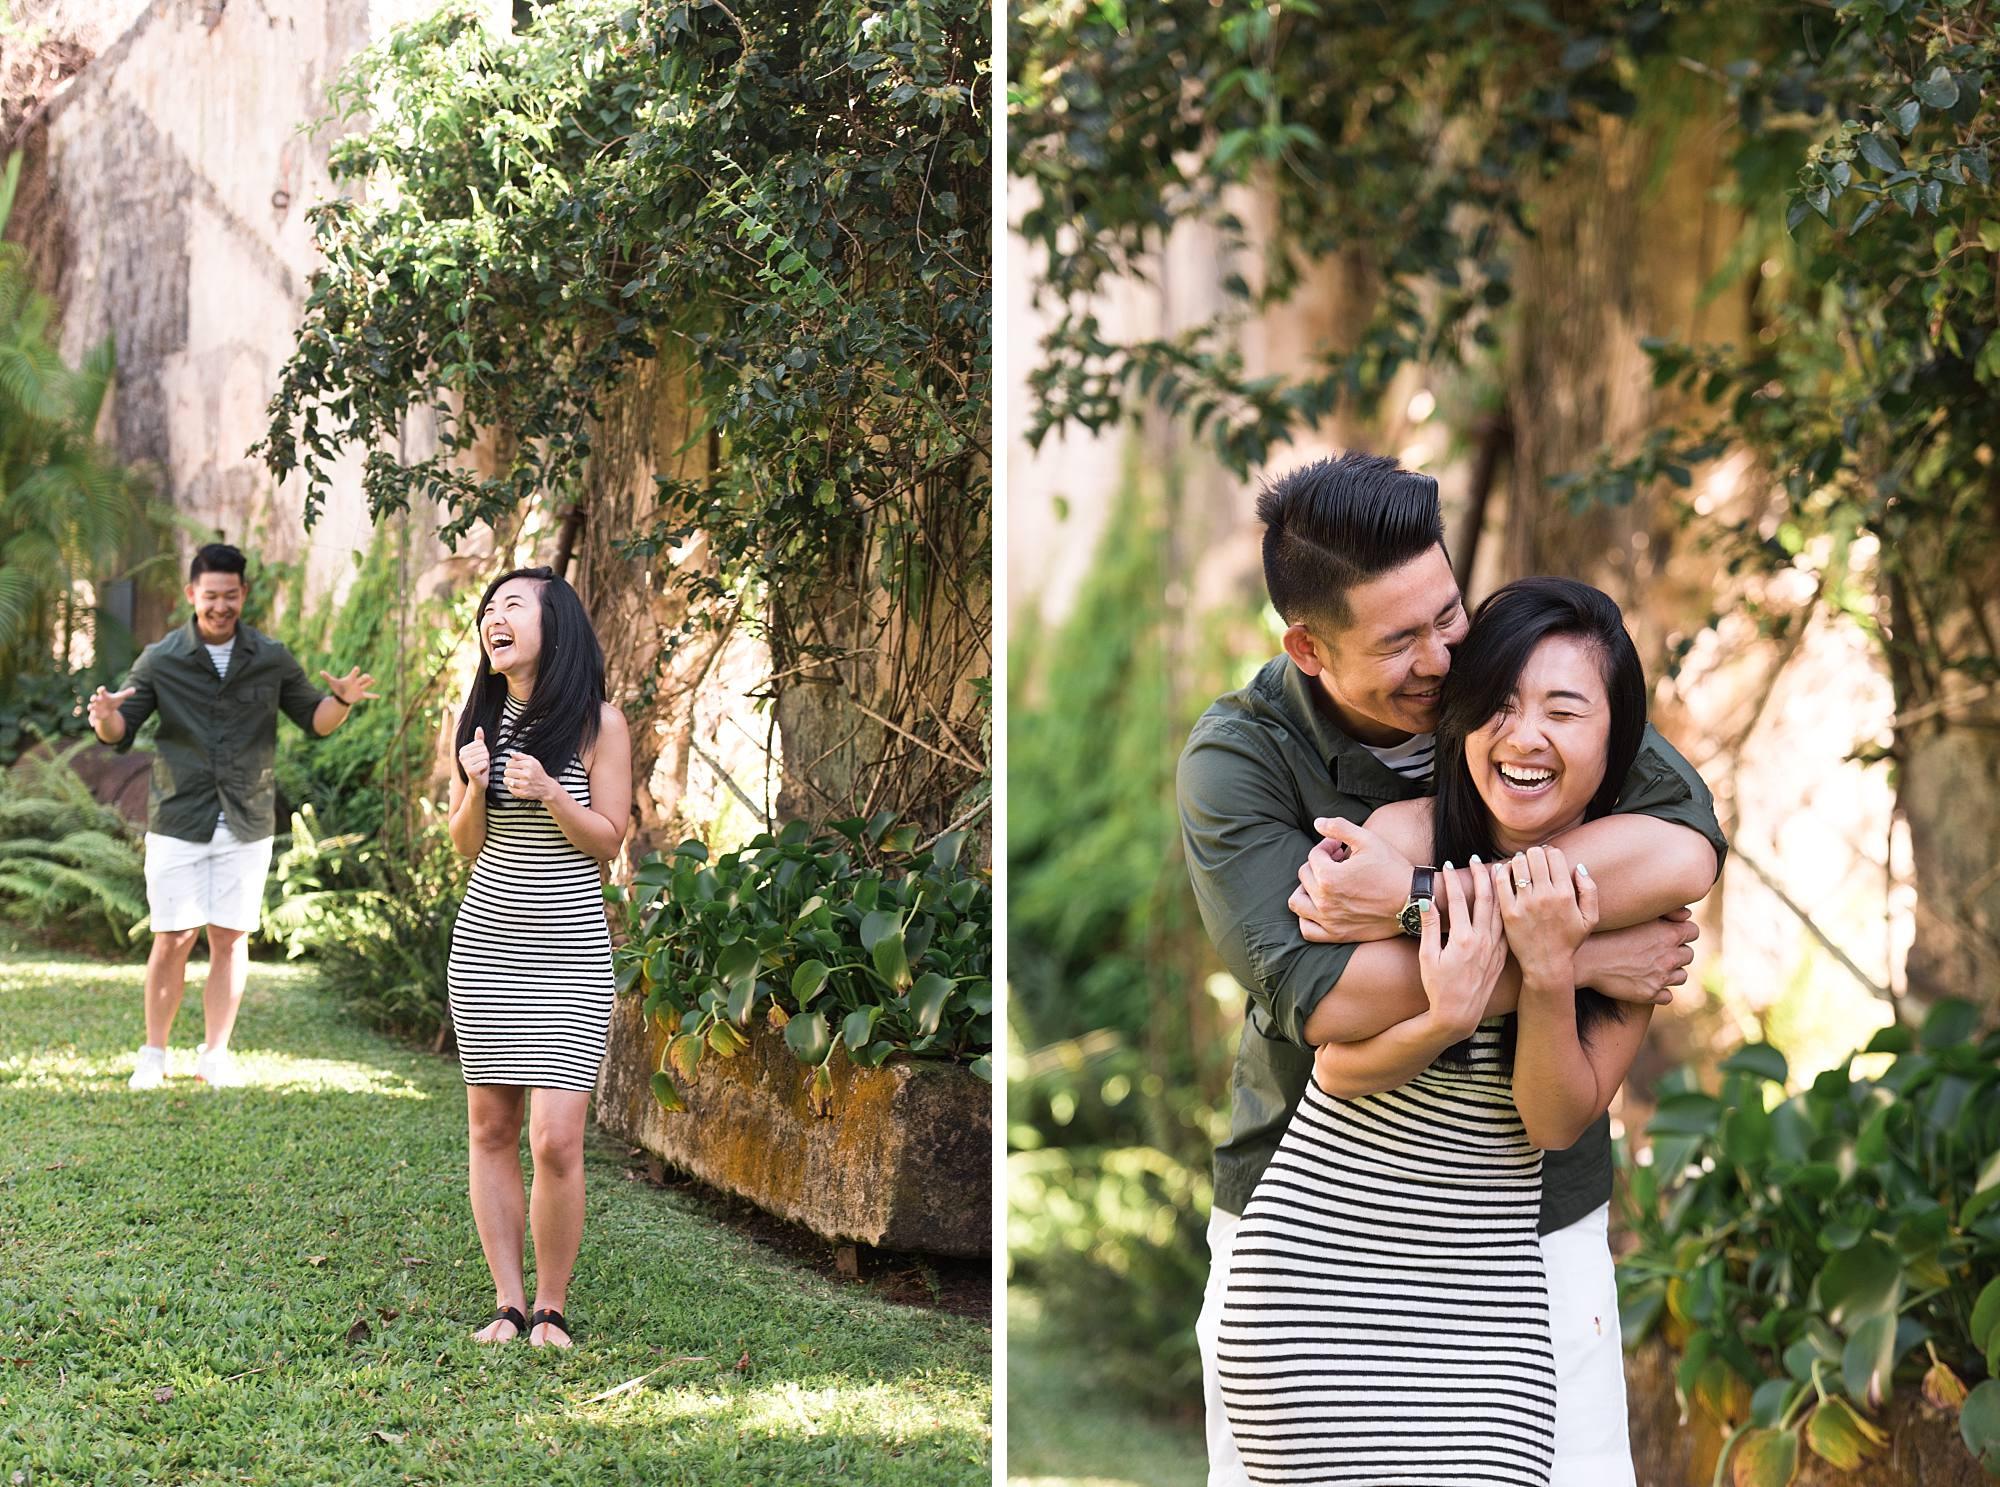 Man coming up to hug his new fiance in a ninja style hug